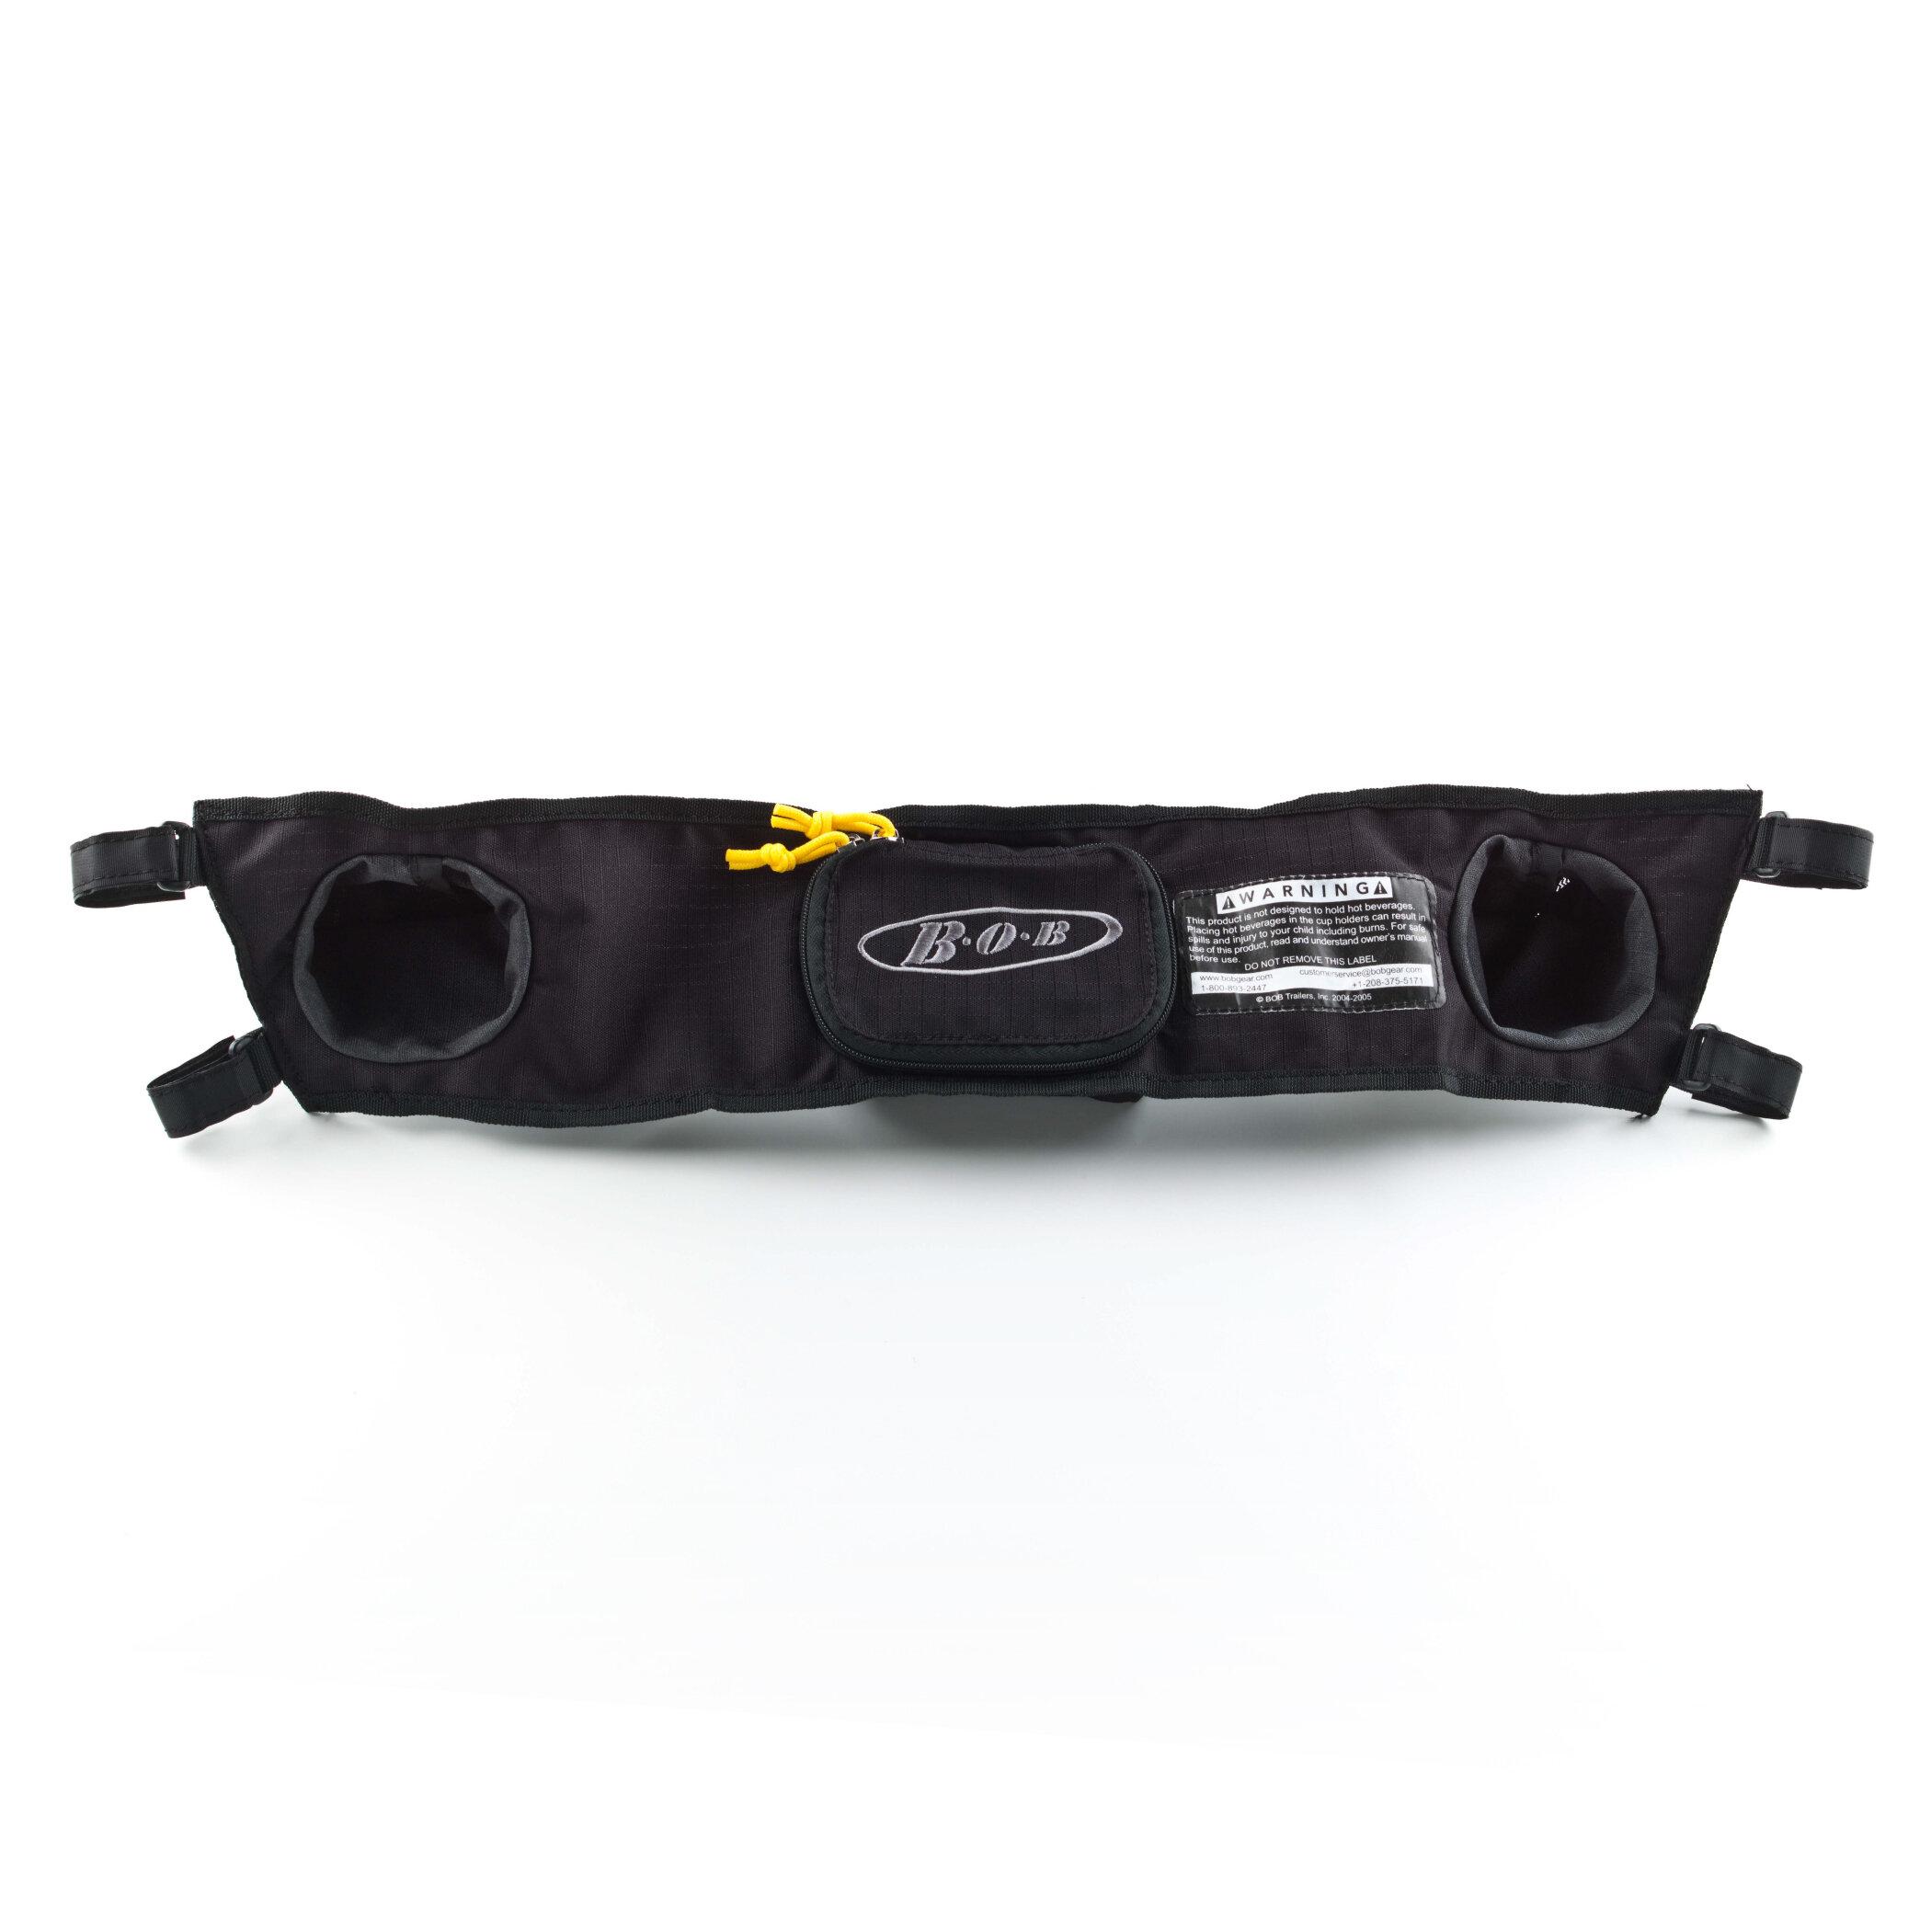 duallie handle bar consoles bob gear